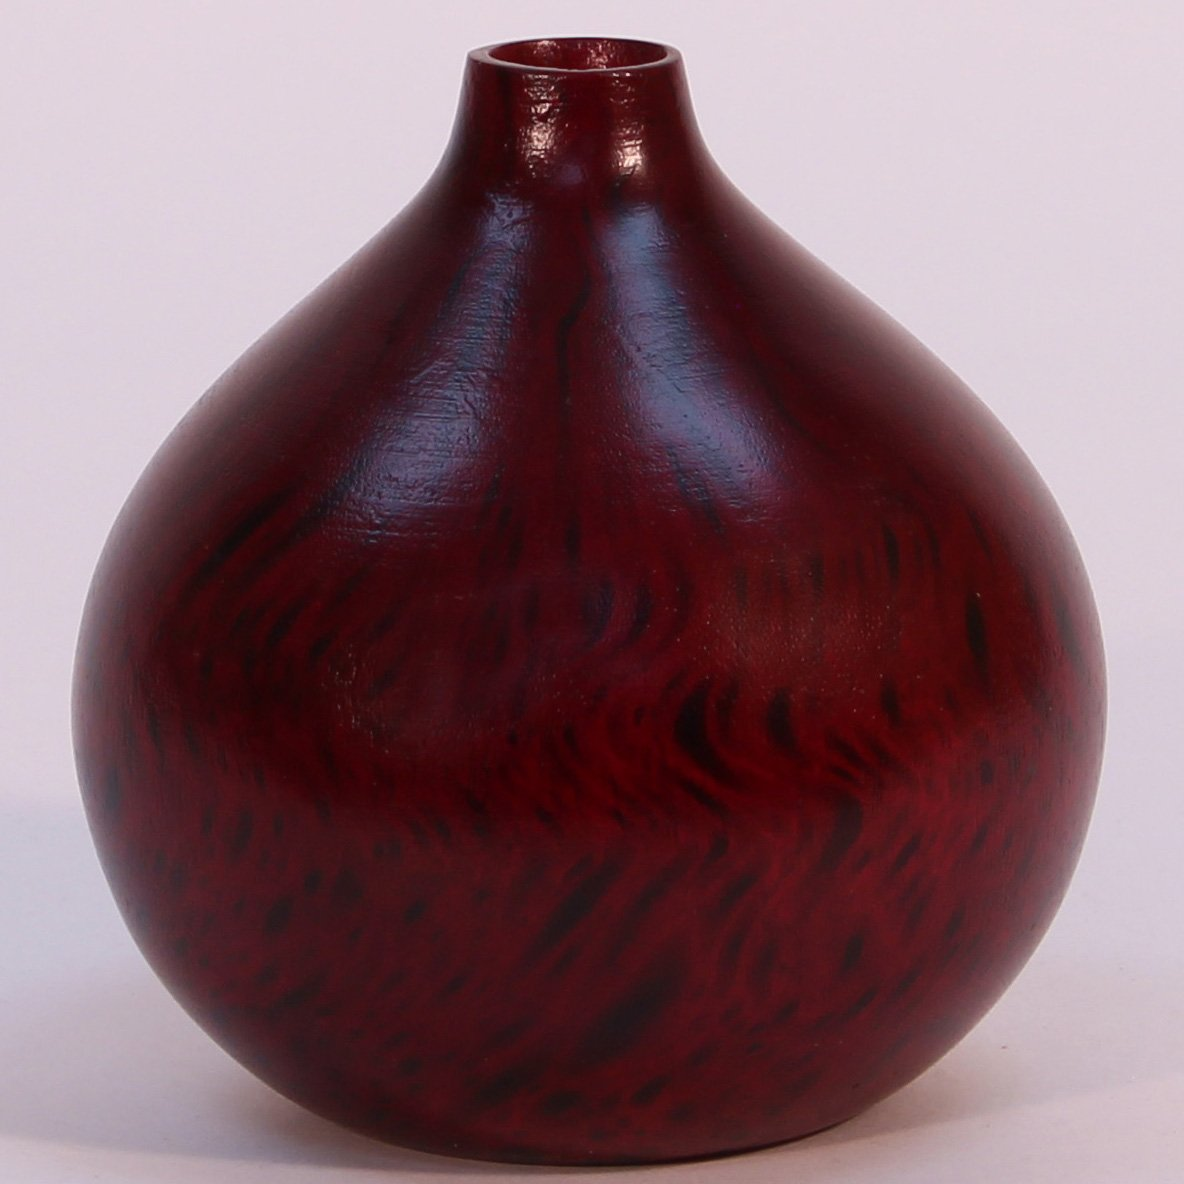 Green Floral Crafts Mango Wood Large (7'' diameter) Onion Vase - Cherry